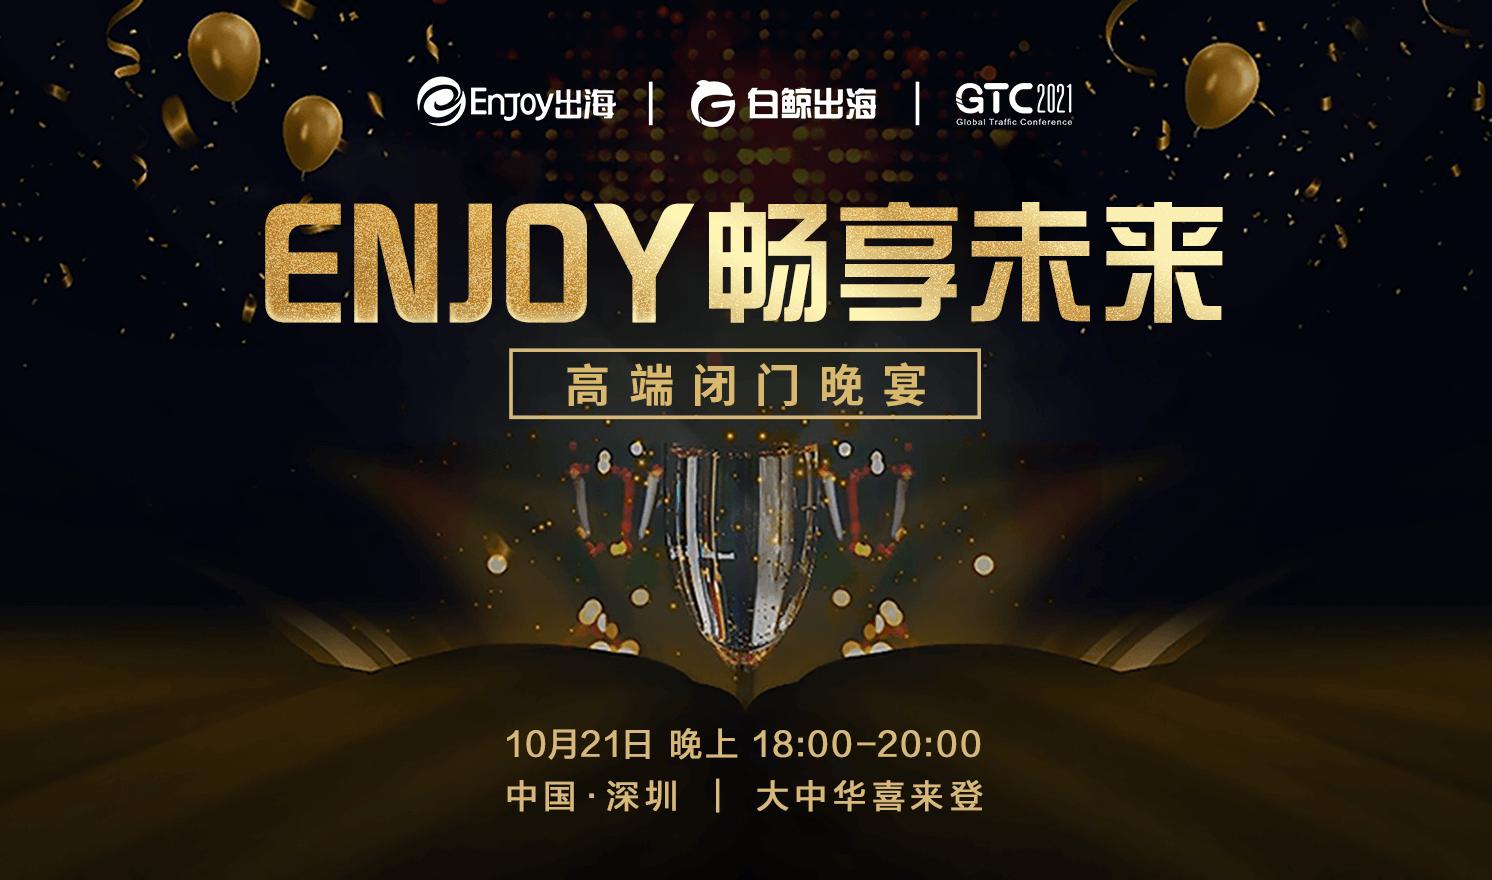 Enjoy畅享未来——高端闭门晚宴(2021-10-21)